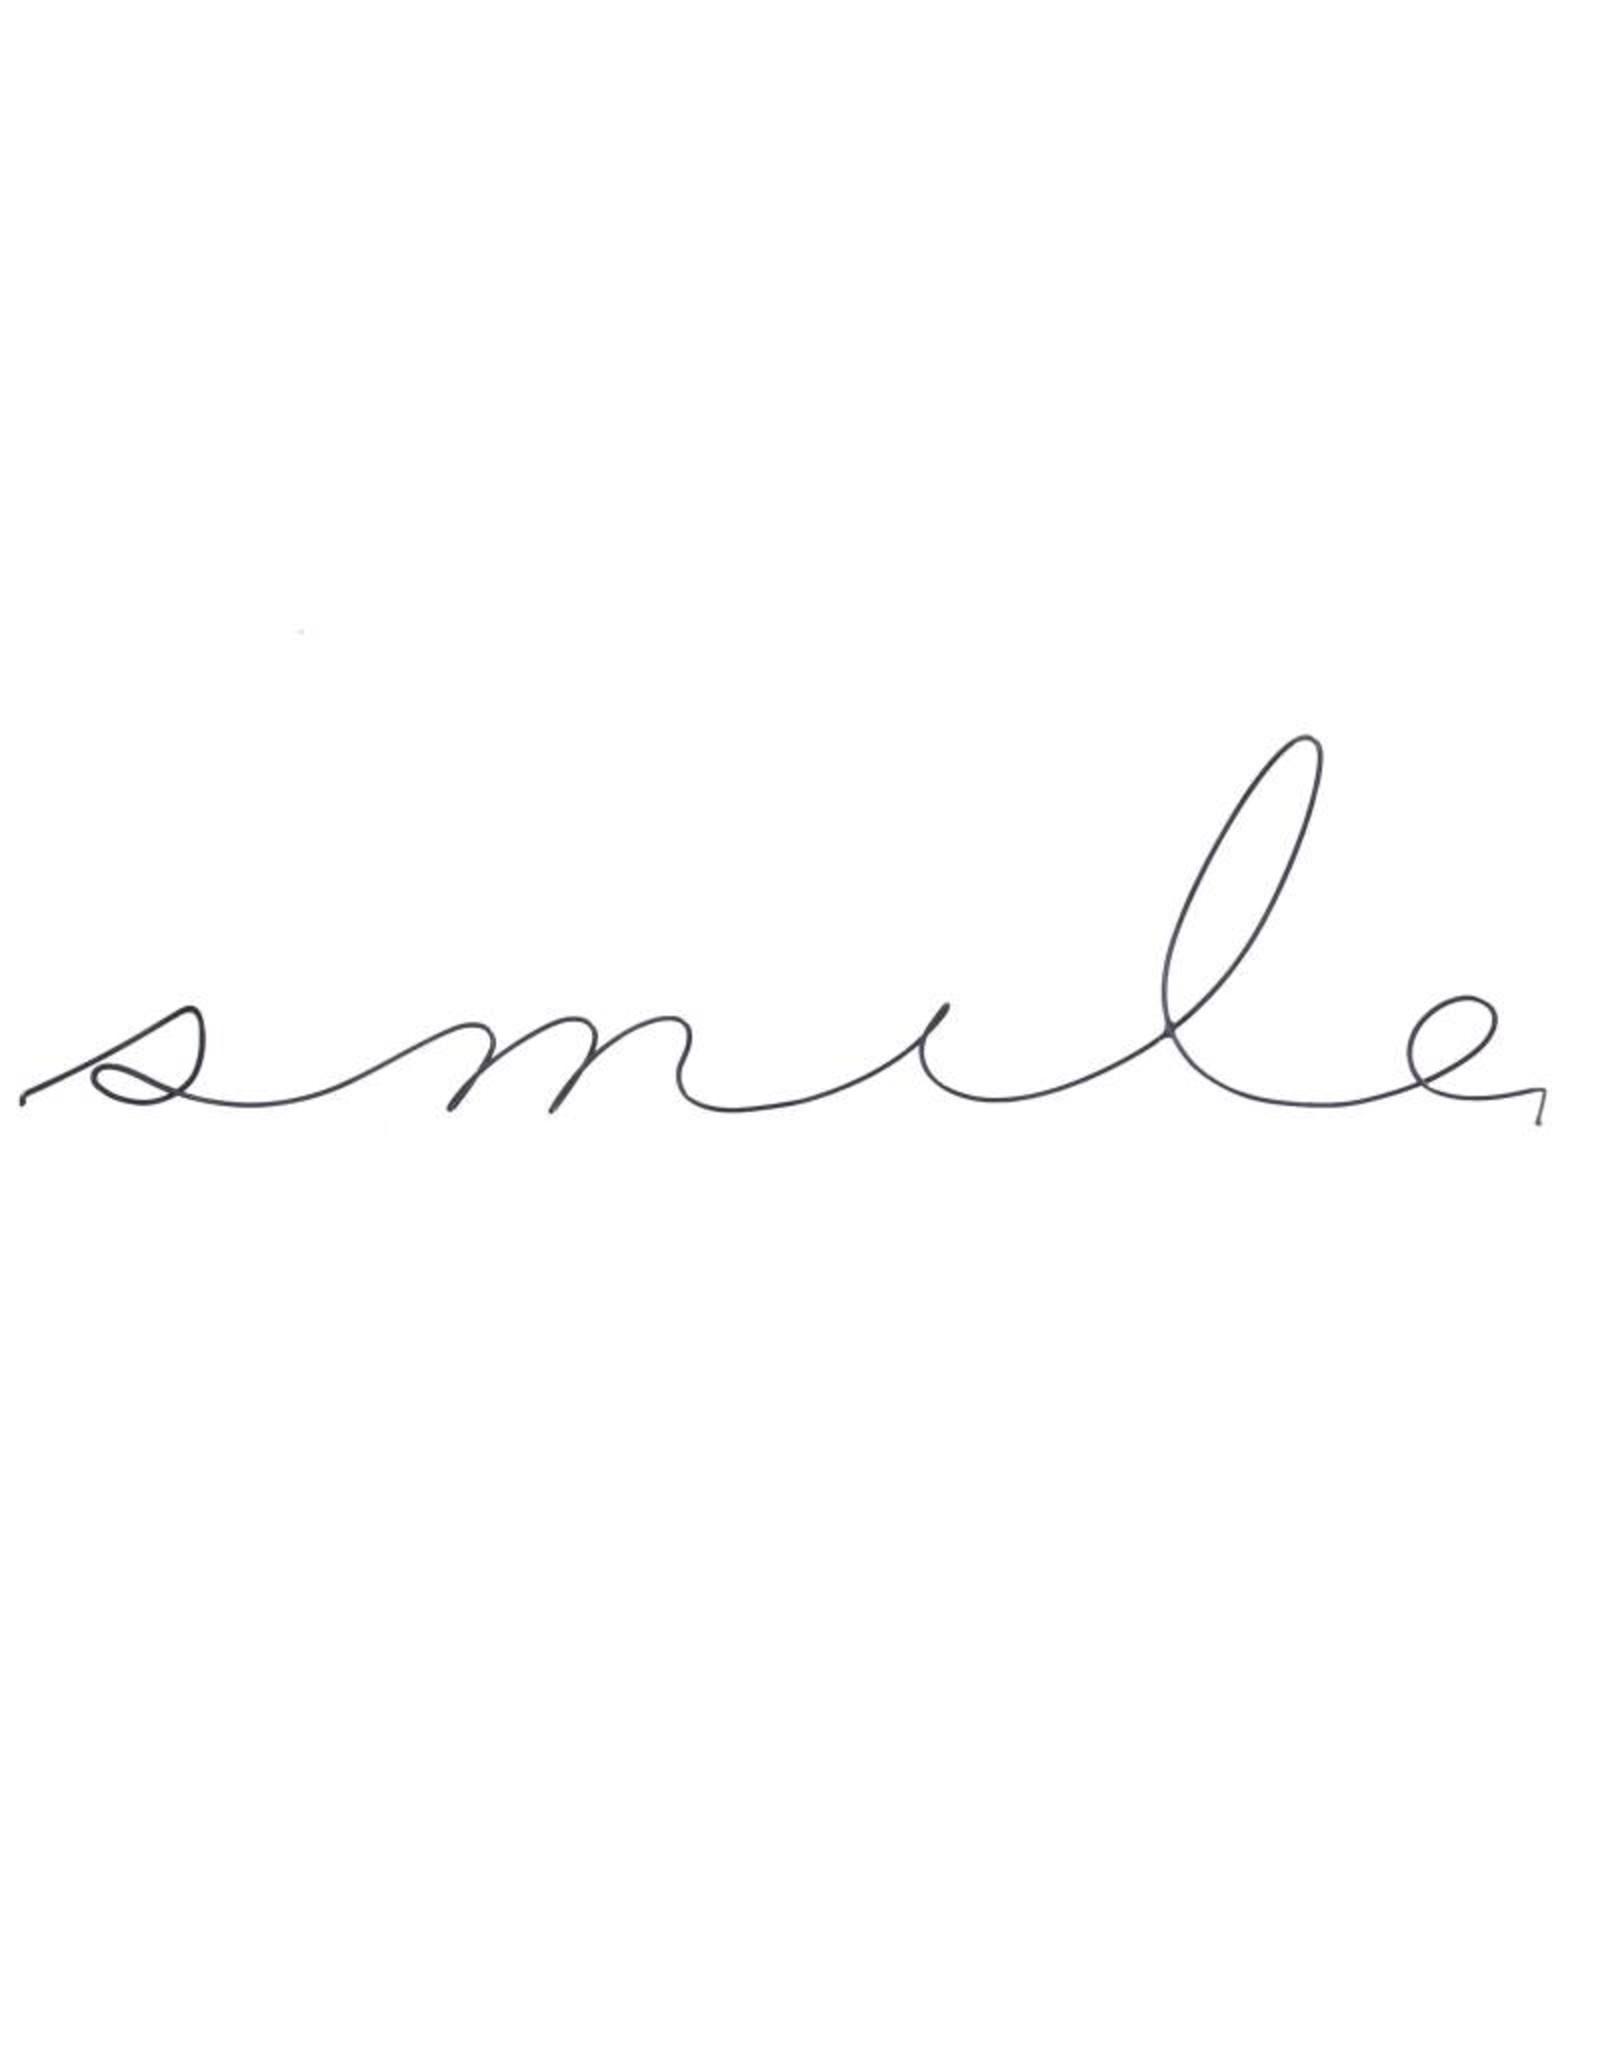 Gauge NYC 'smile' Wire Word Poetic